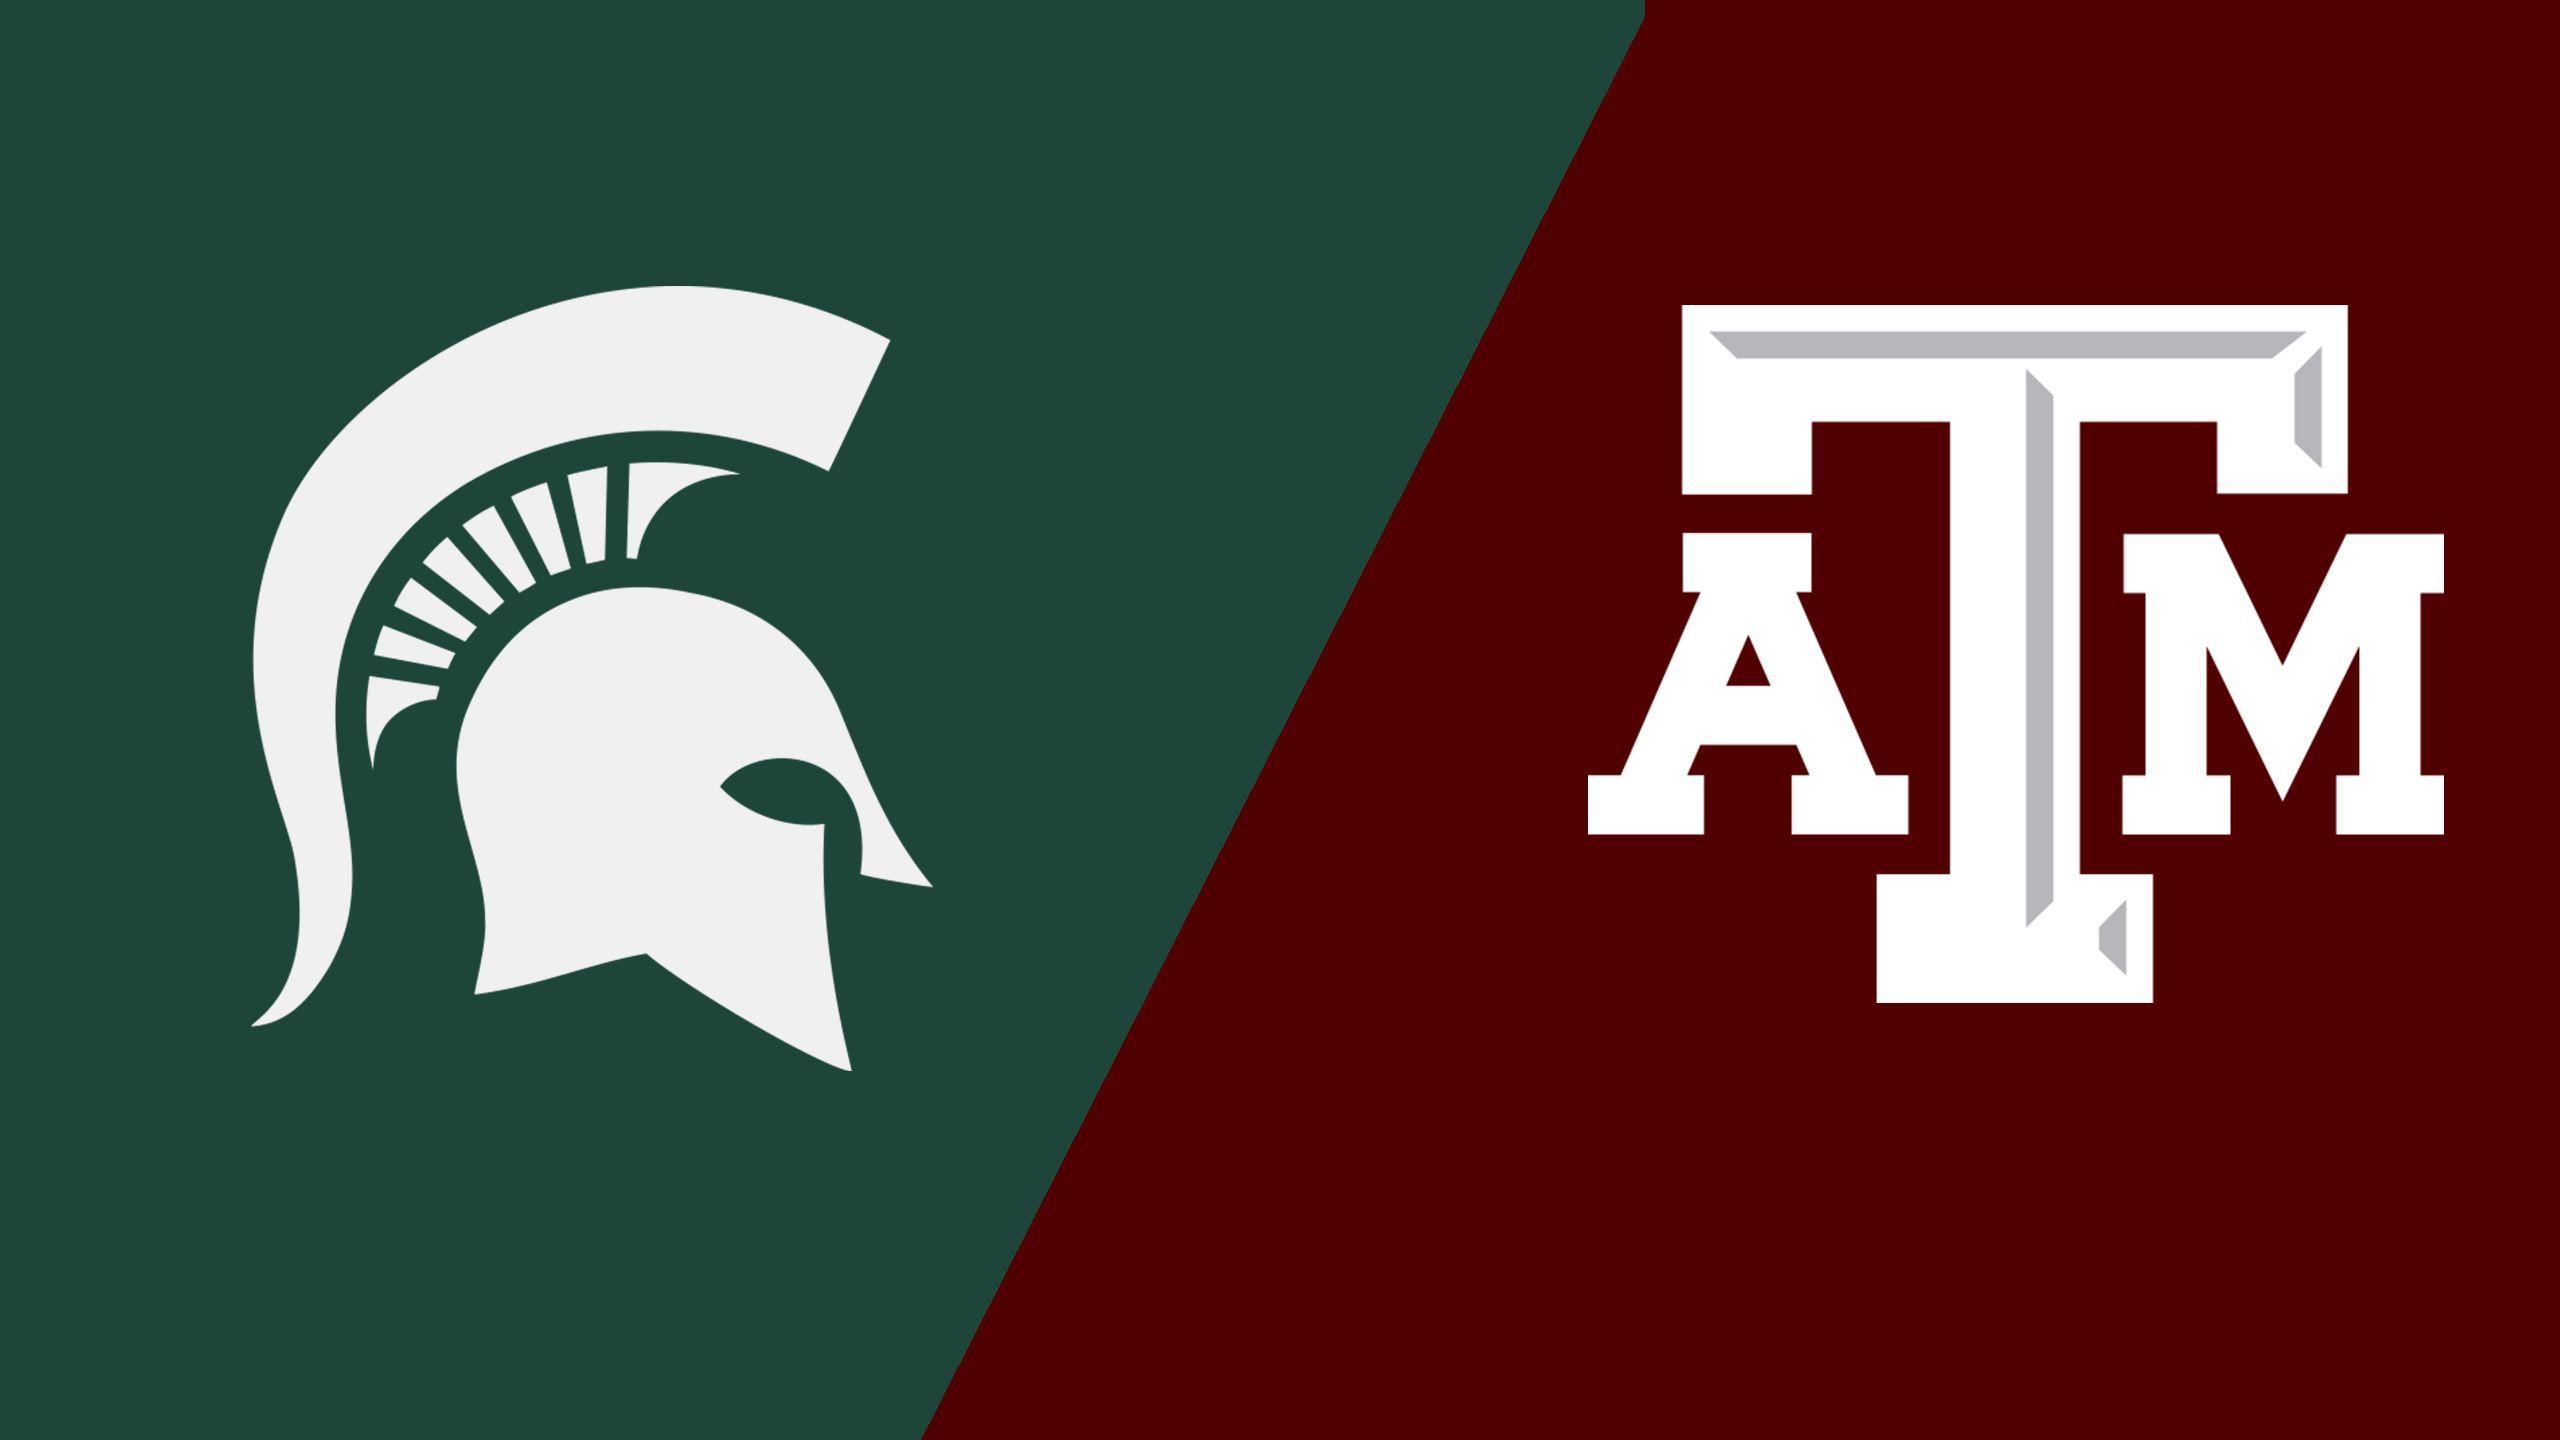 Michigan State vs. #7 Texas A&M (Softball)